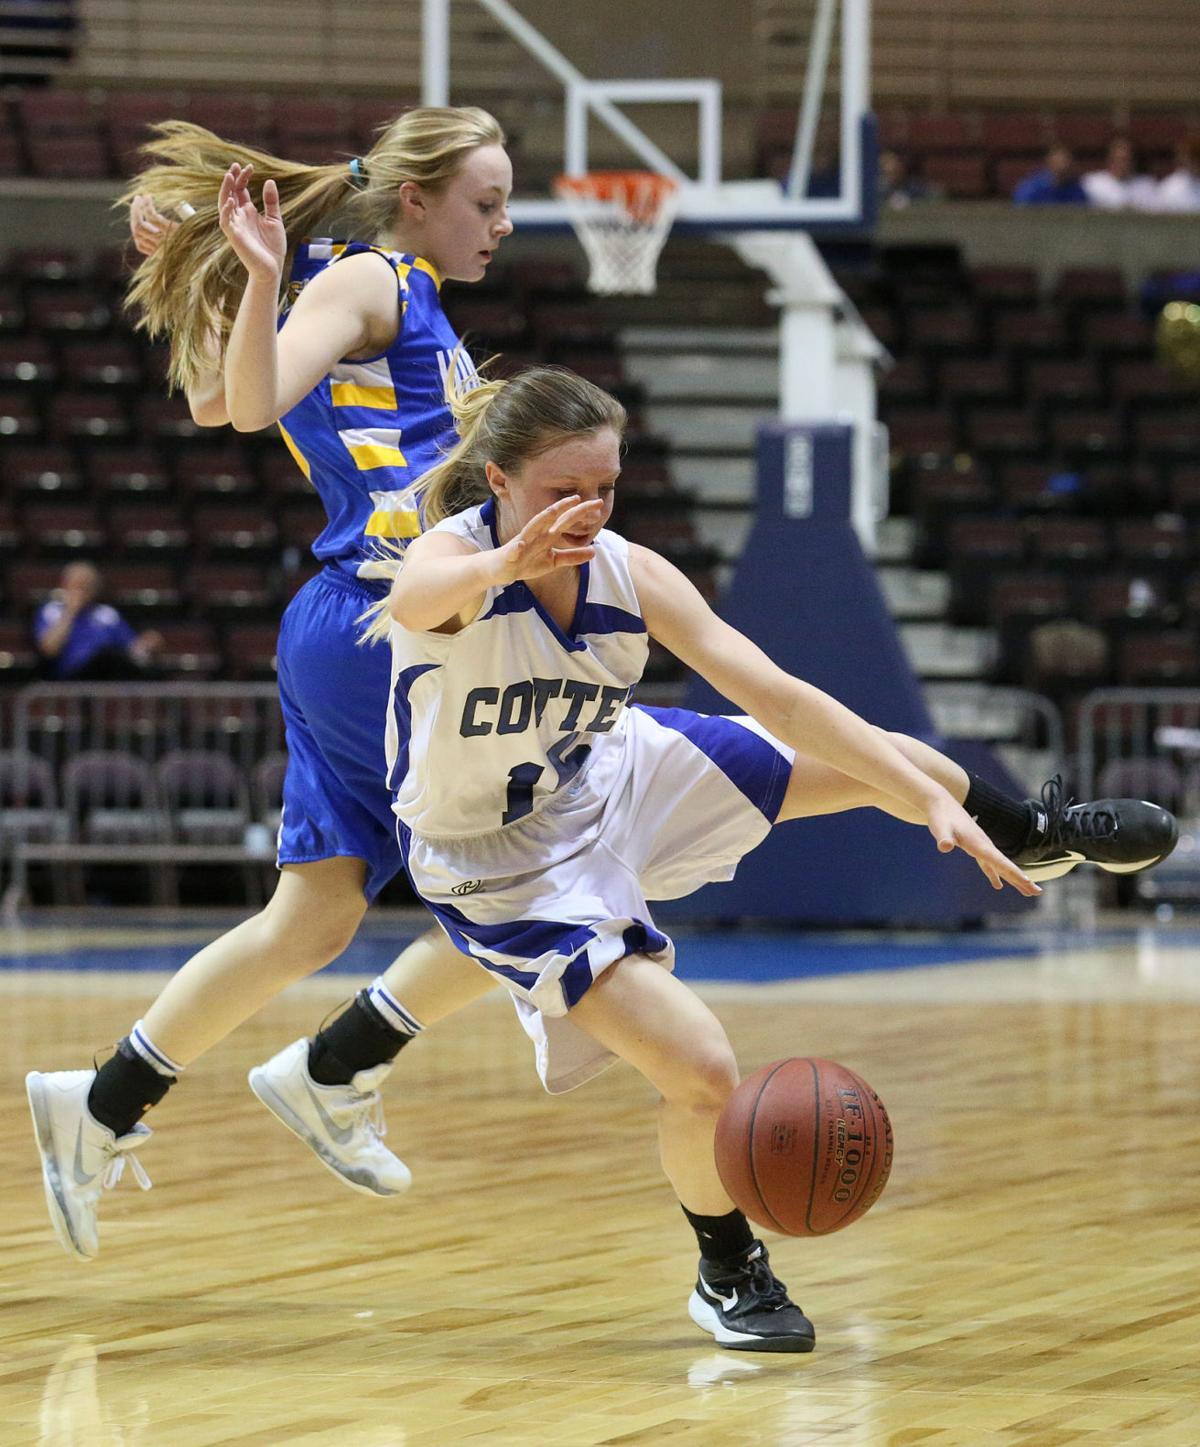 cotter women Cotter wilson class: freshman: hometown: shreveport, la high school: ogburn high school: height: 5-10: friday, april 6, 2018 - women's basketball.